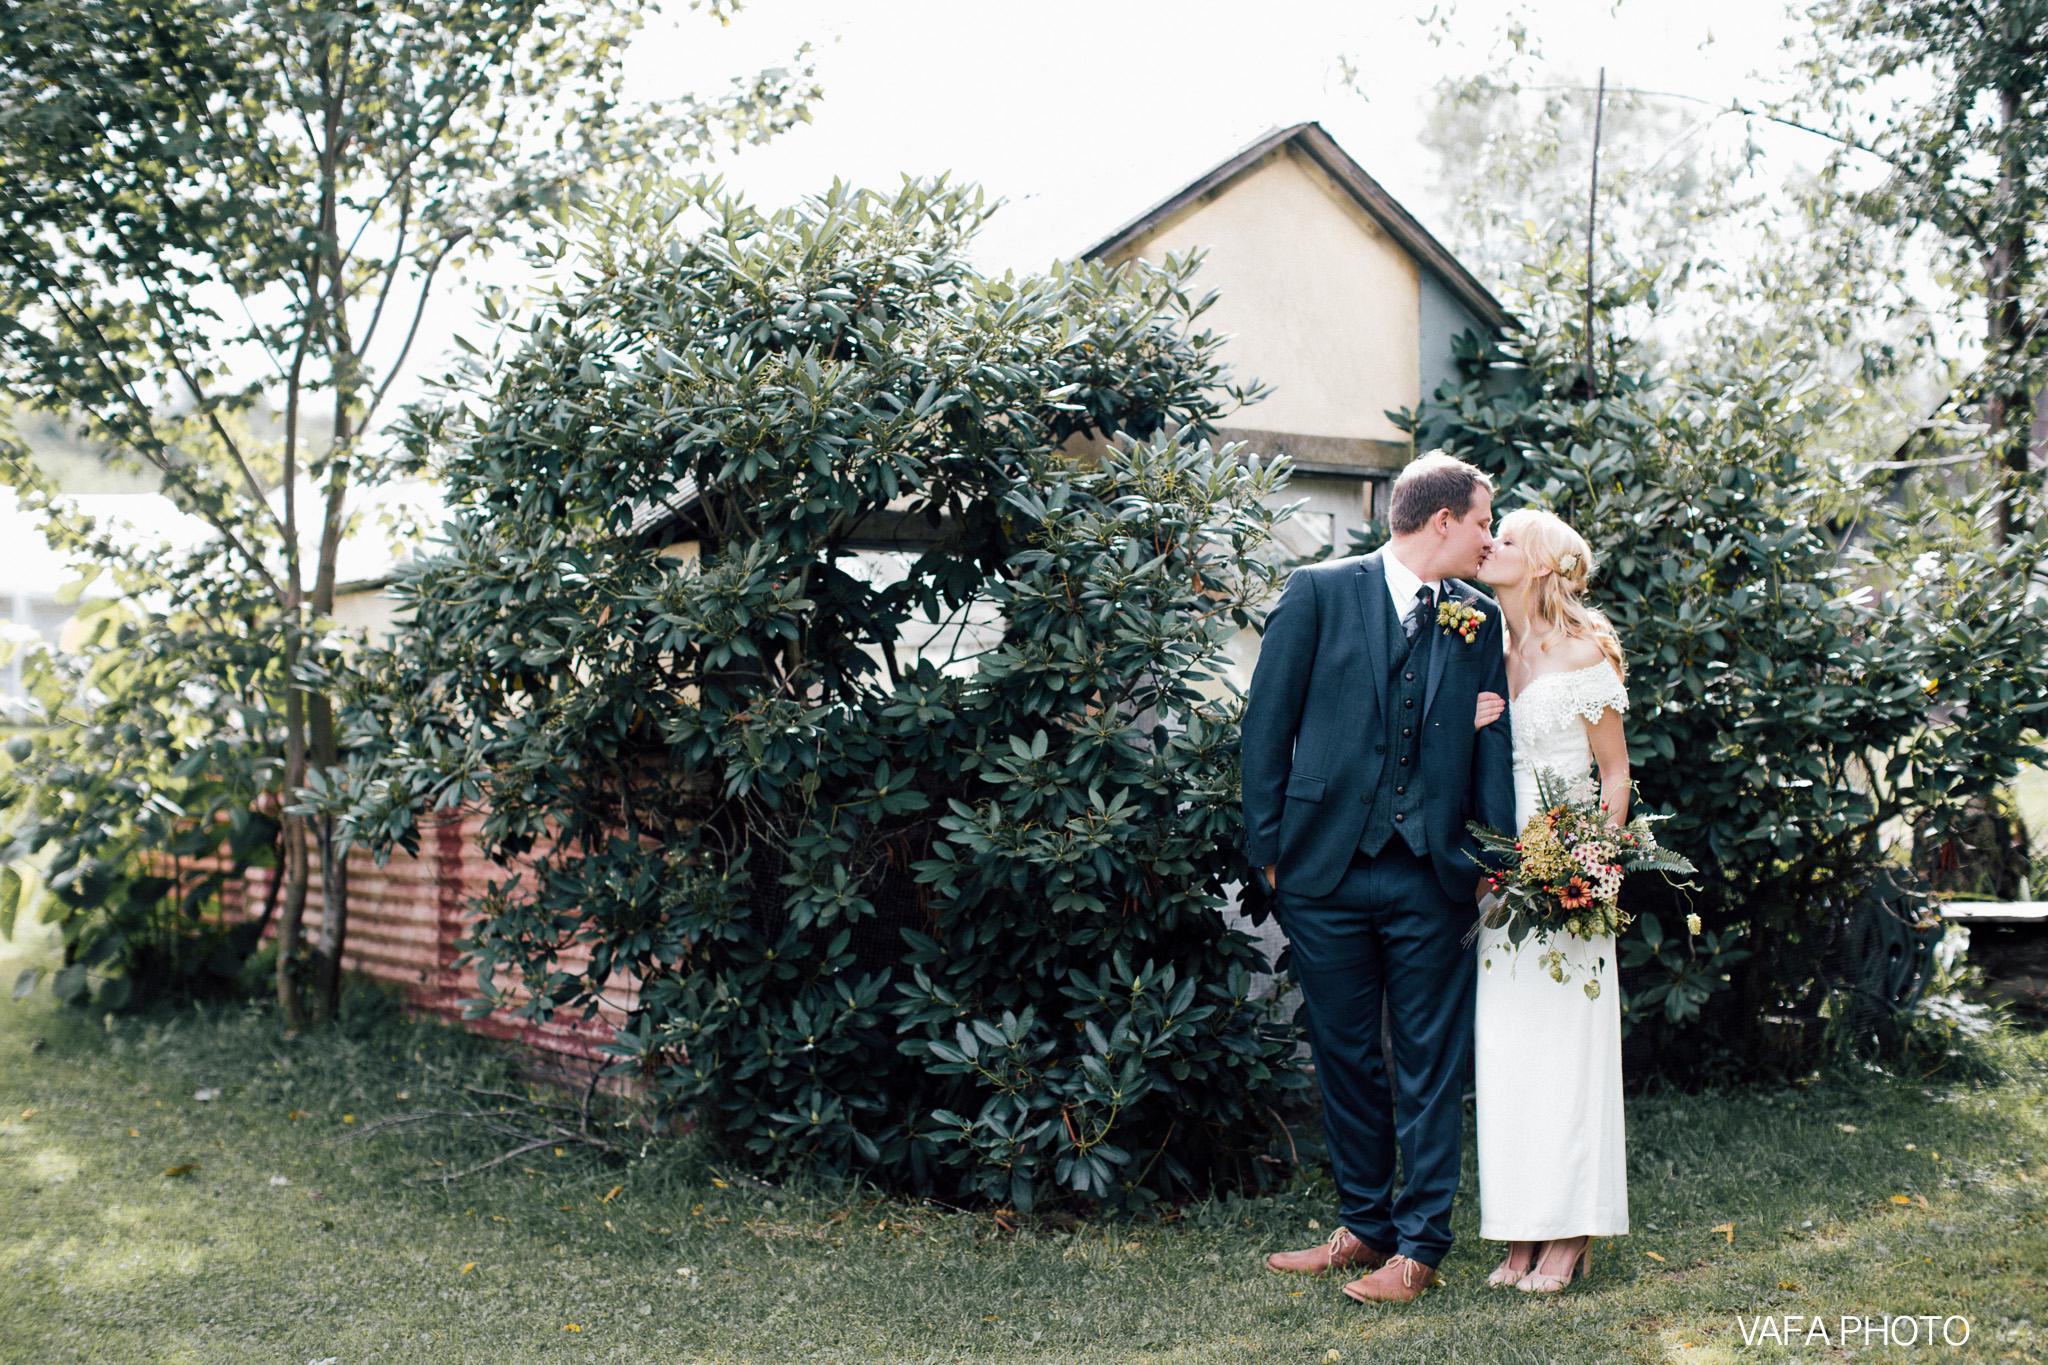 Belsolda-Farm-Wedding-Christy-Eric-Vafa-Photo-211.jpg